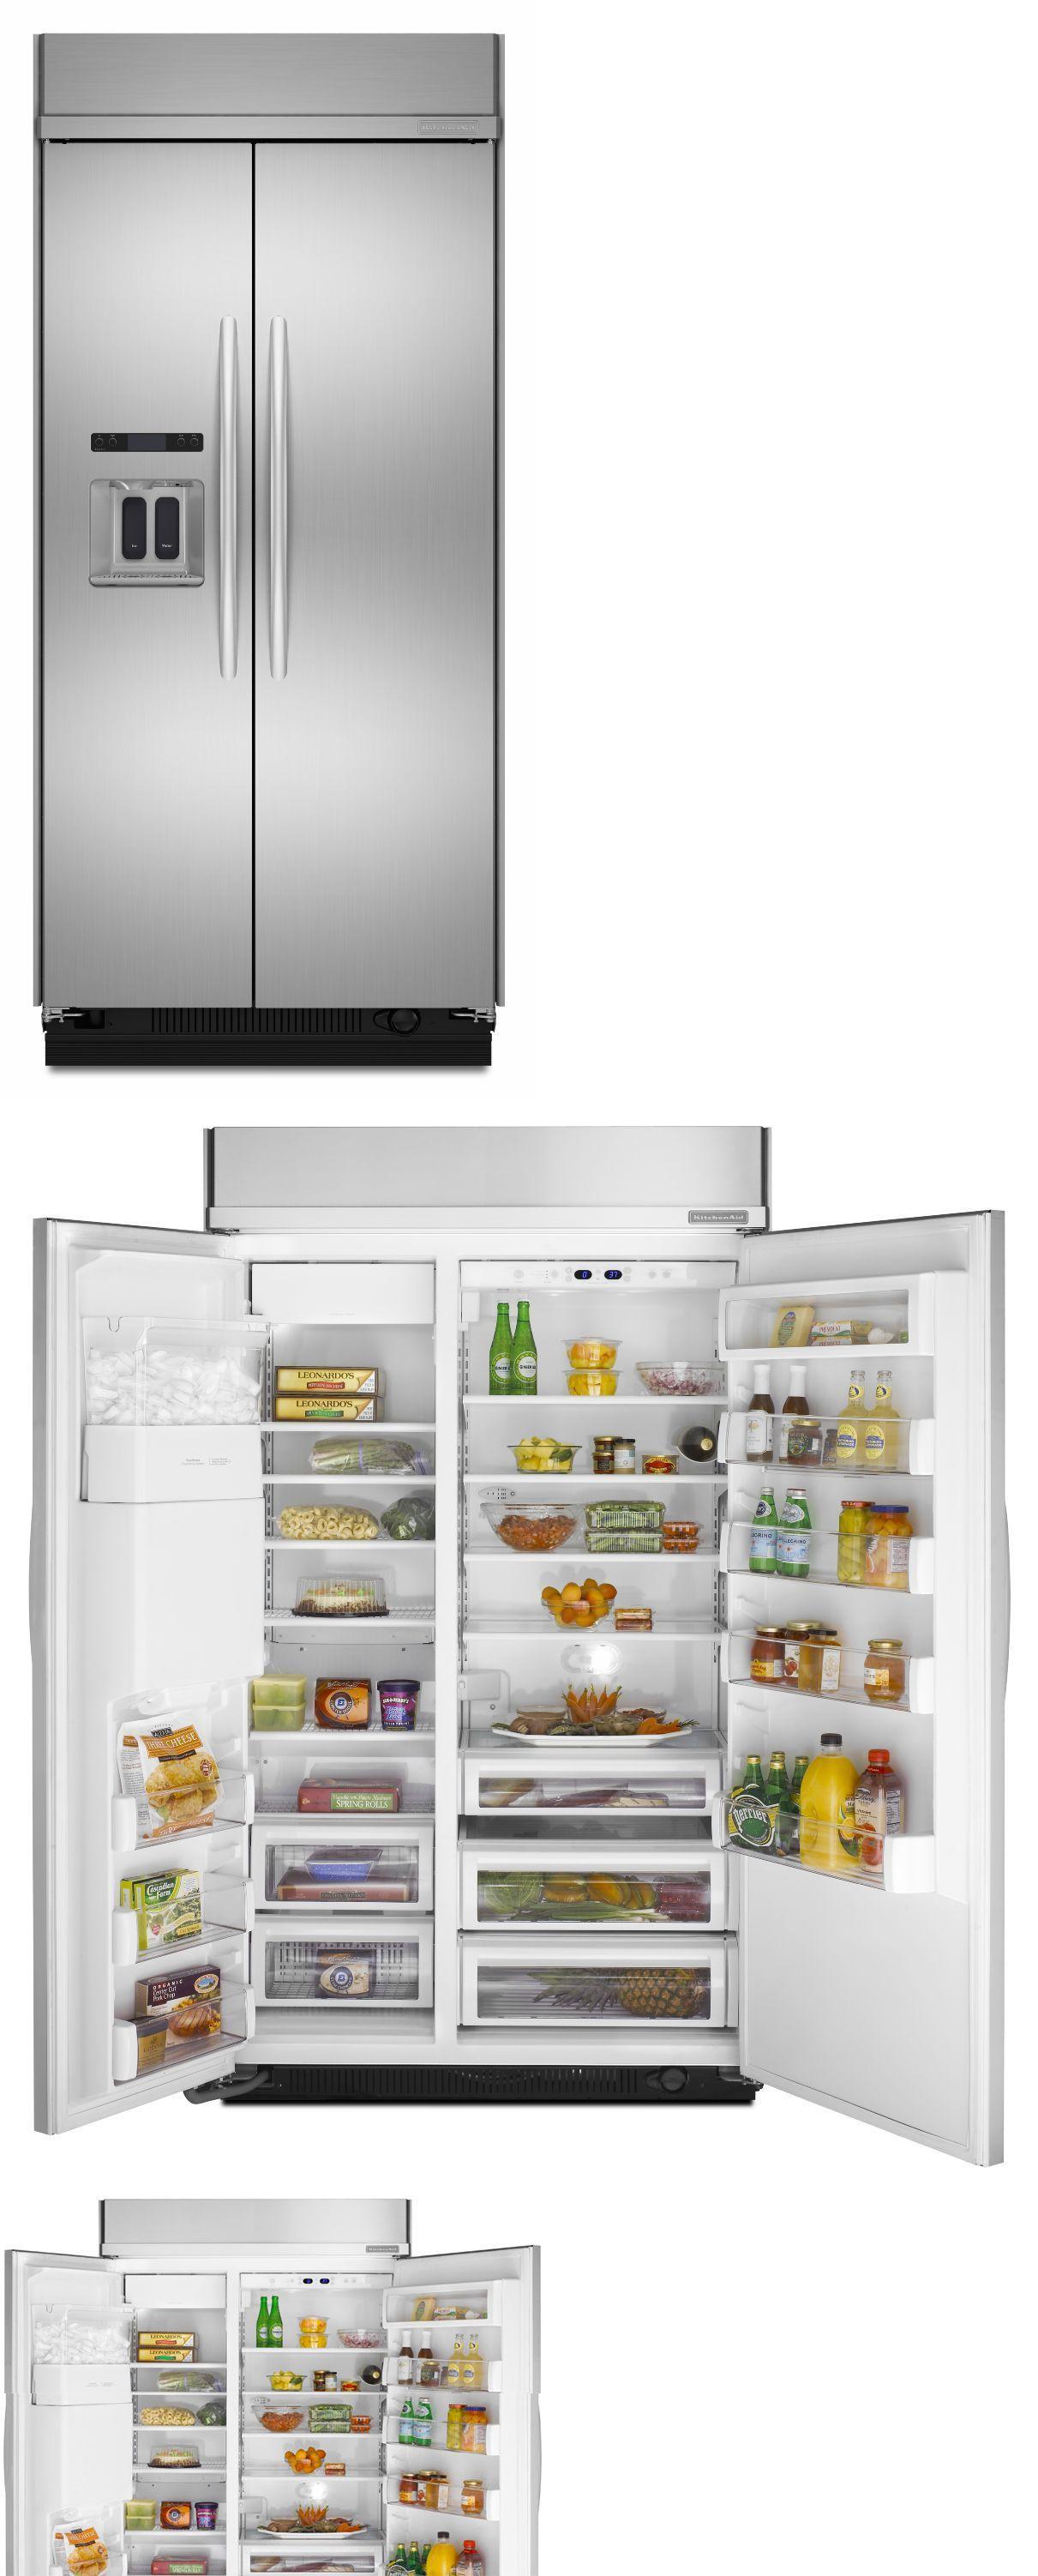 Refrigerators 20713: Kitchenaid Kssc48qvs 48 Built In Side By Side Refrigerator  Architect Series Ii